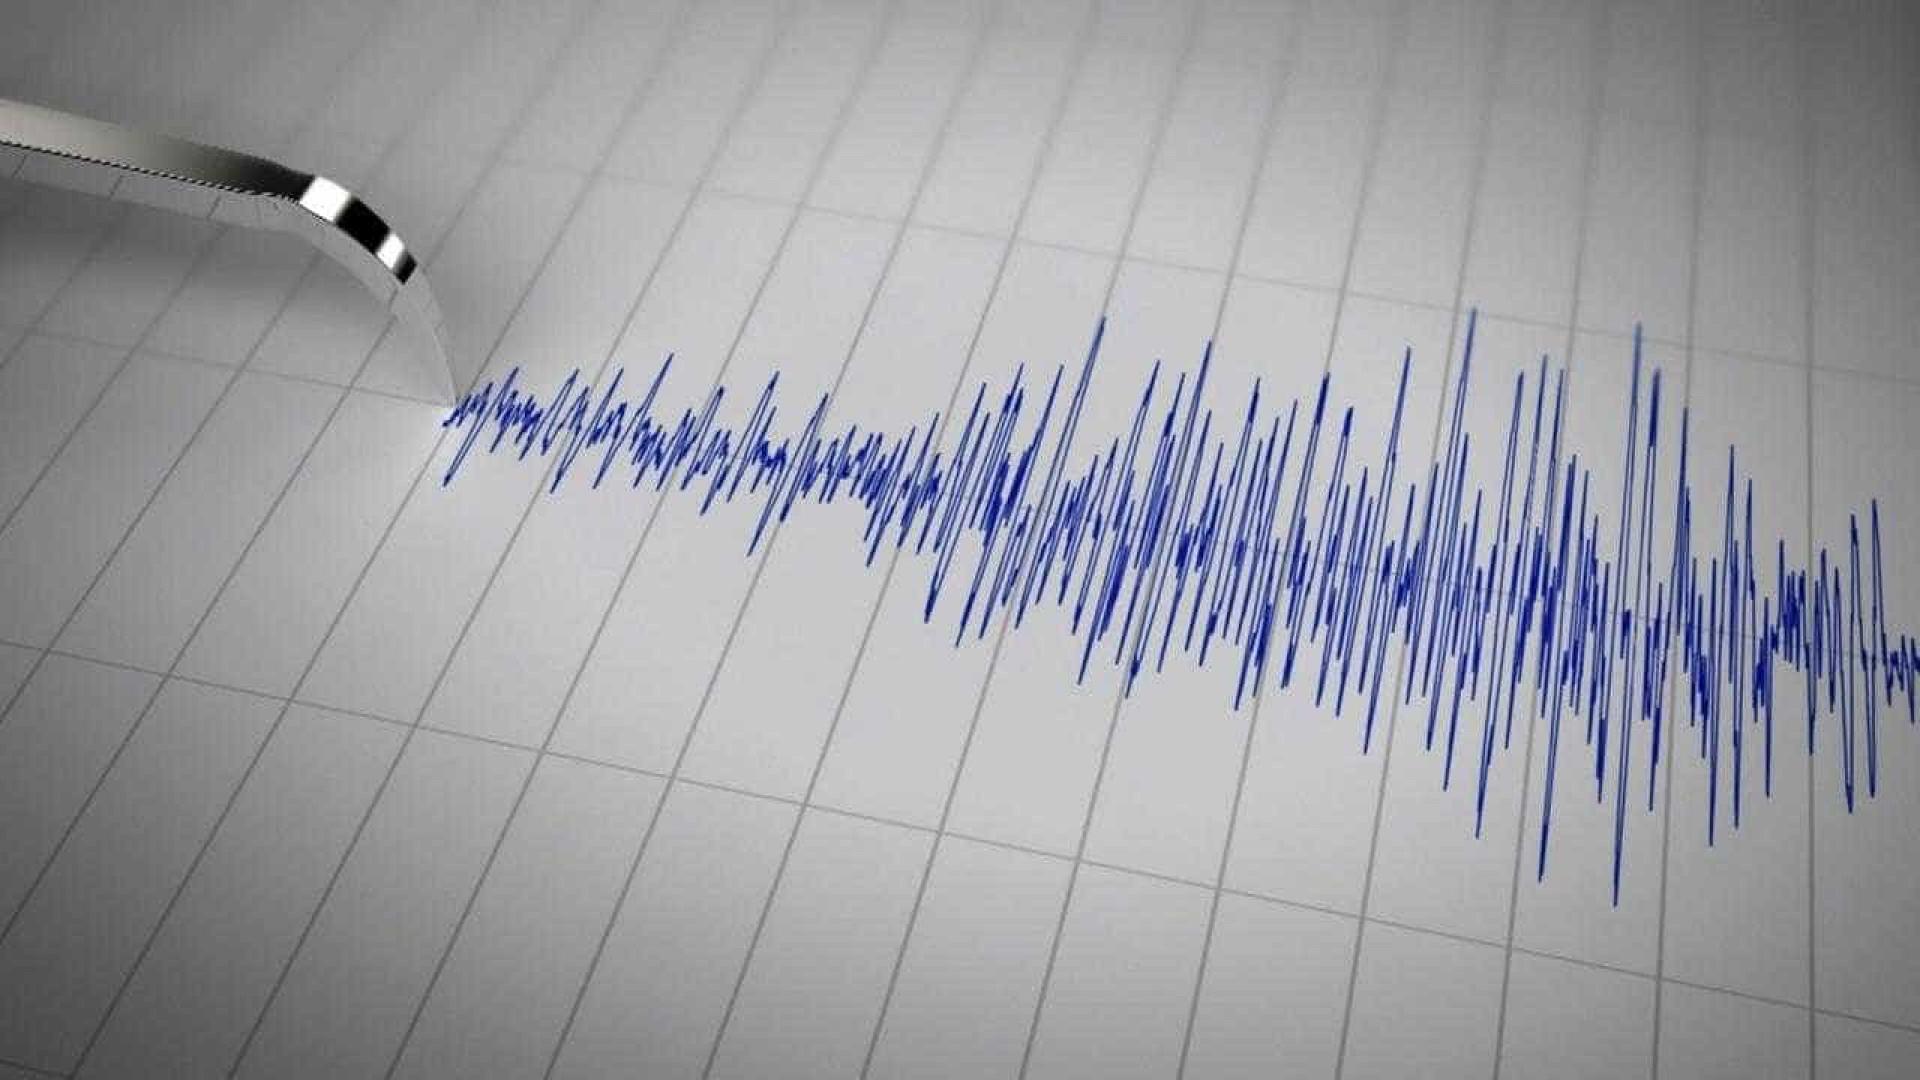 Terremoto de magnitude 7,8 atinge ilhas do Pacífico